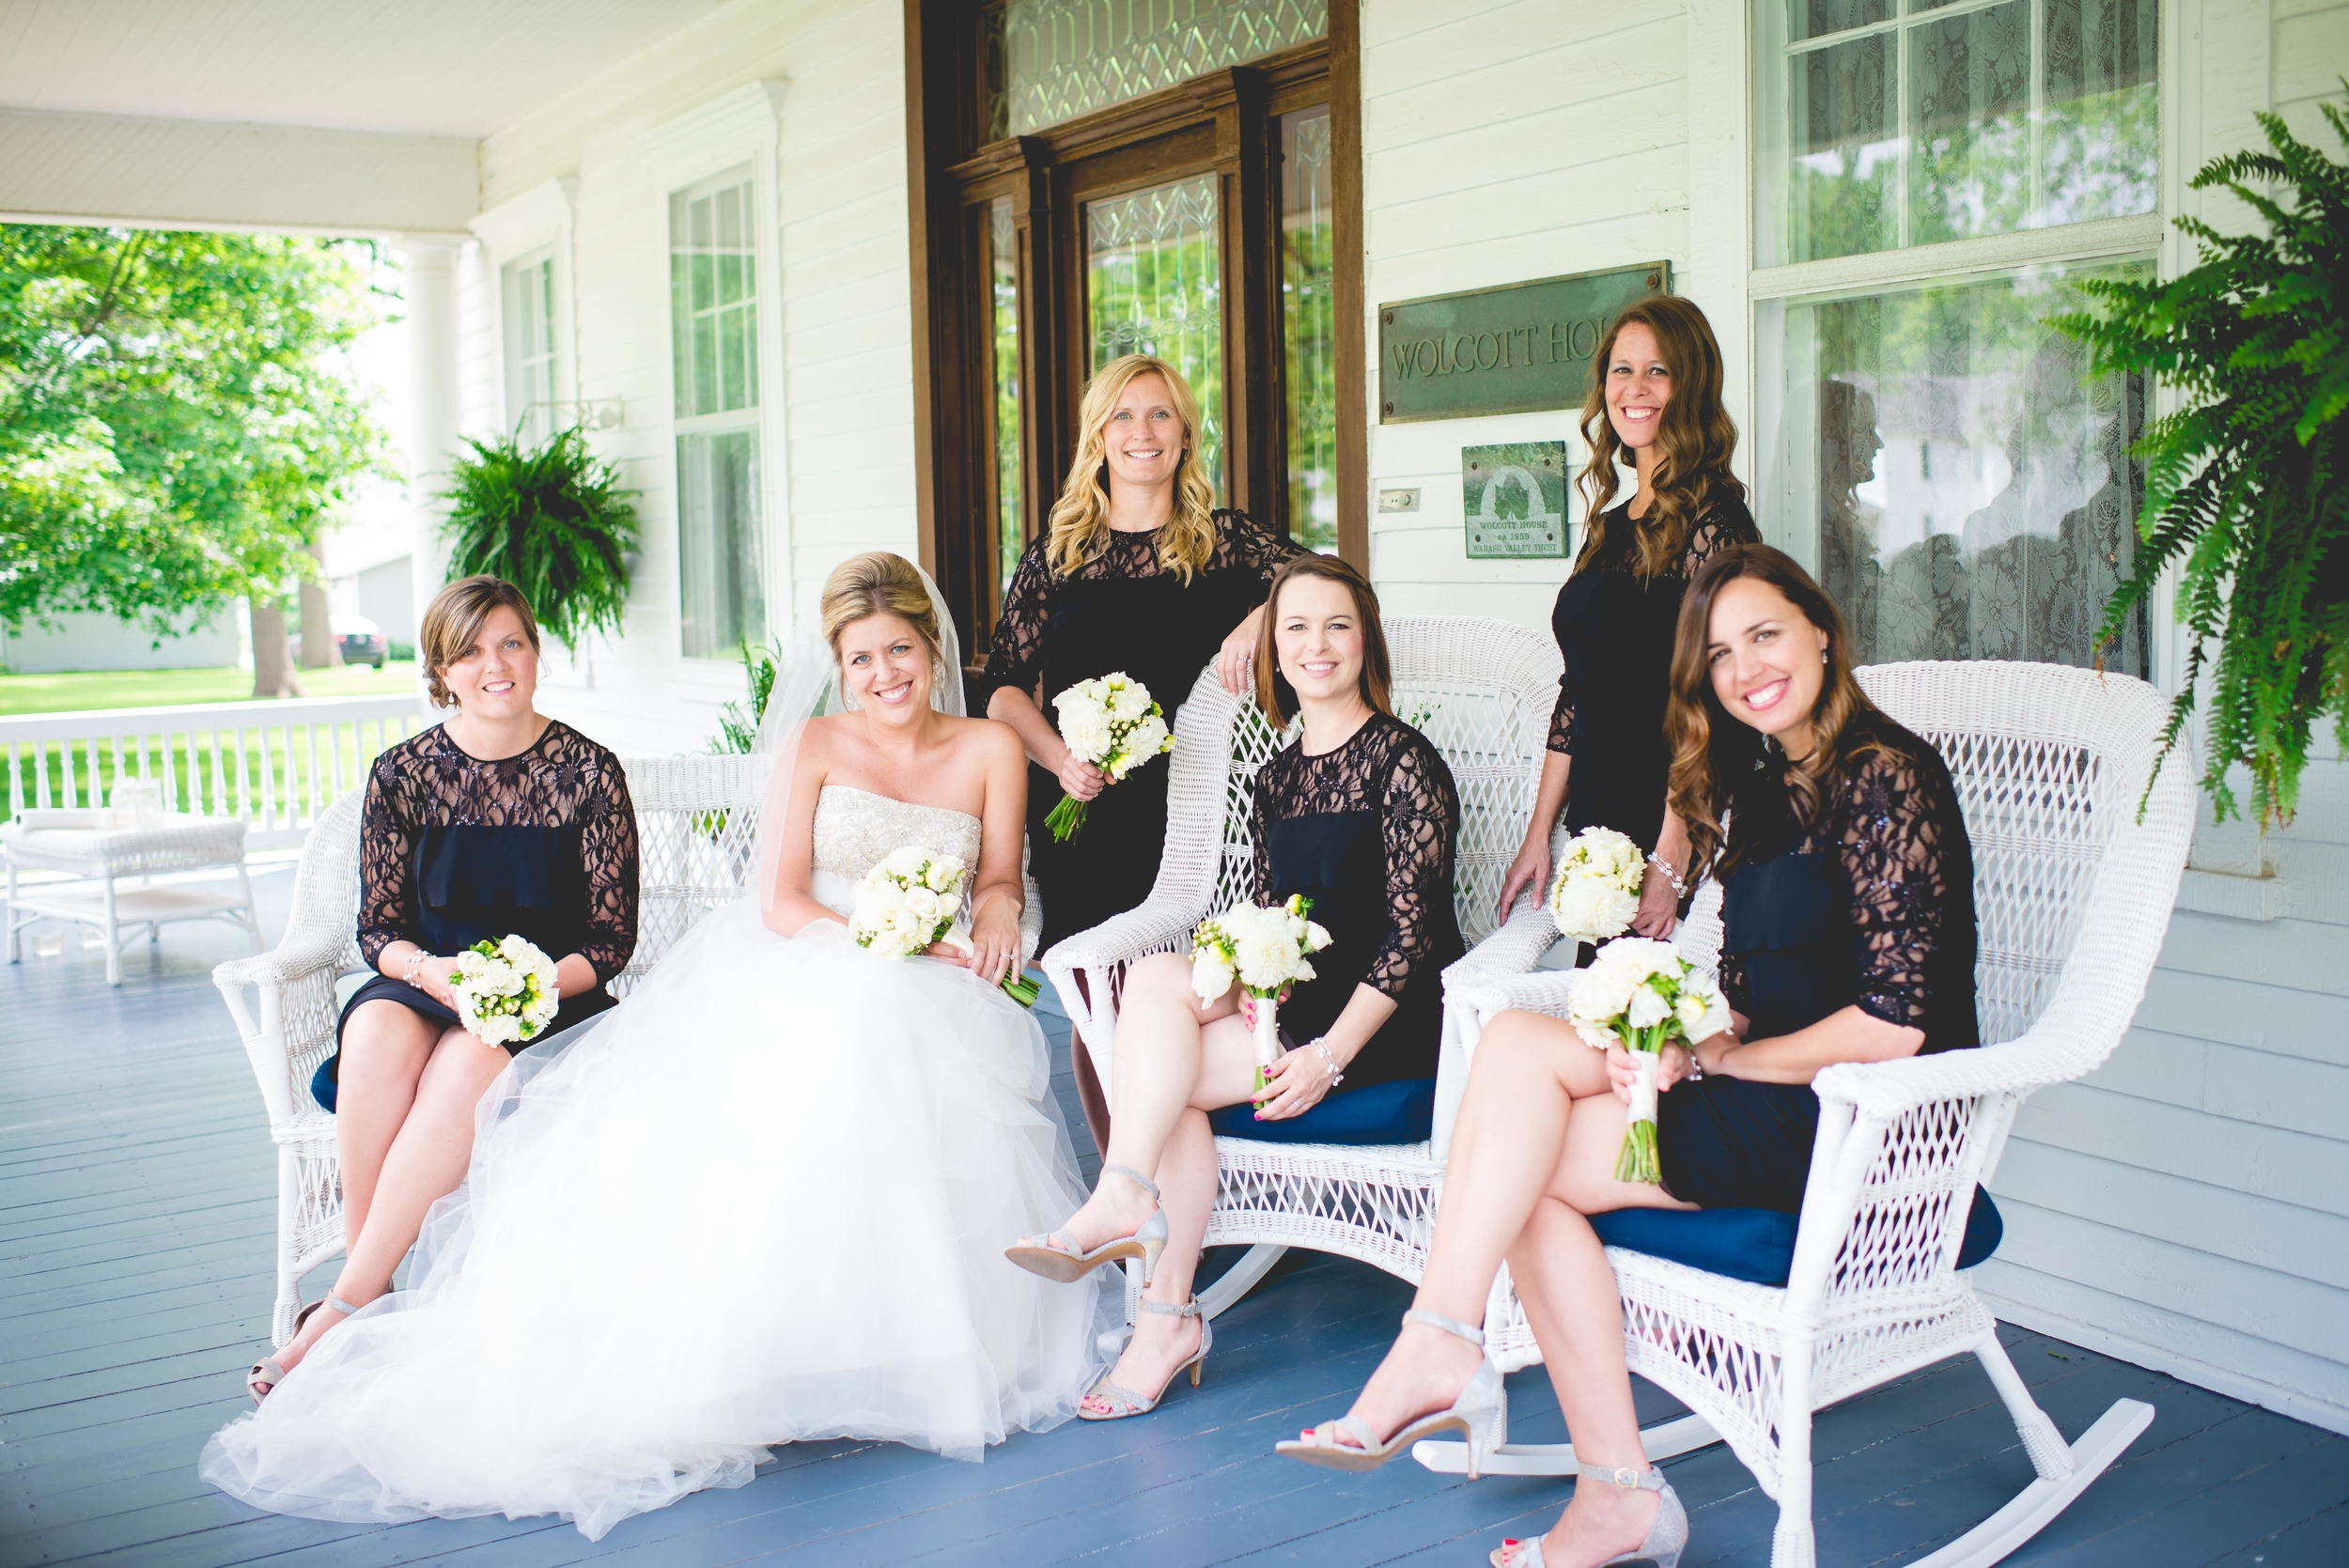 sarasutterphotography_leeandshalon_wedding_2015-208.jpg